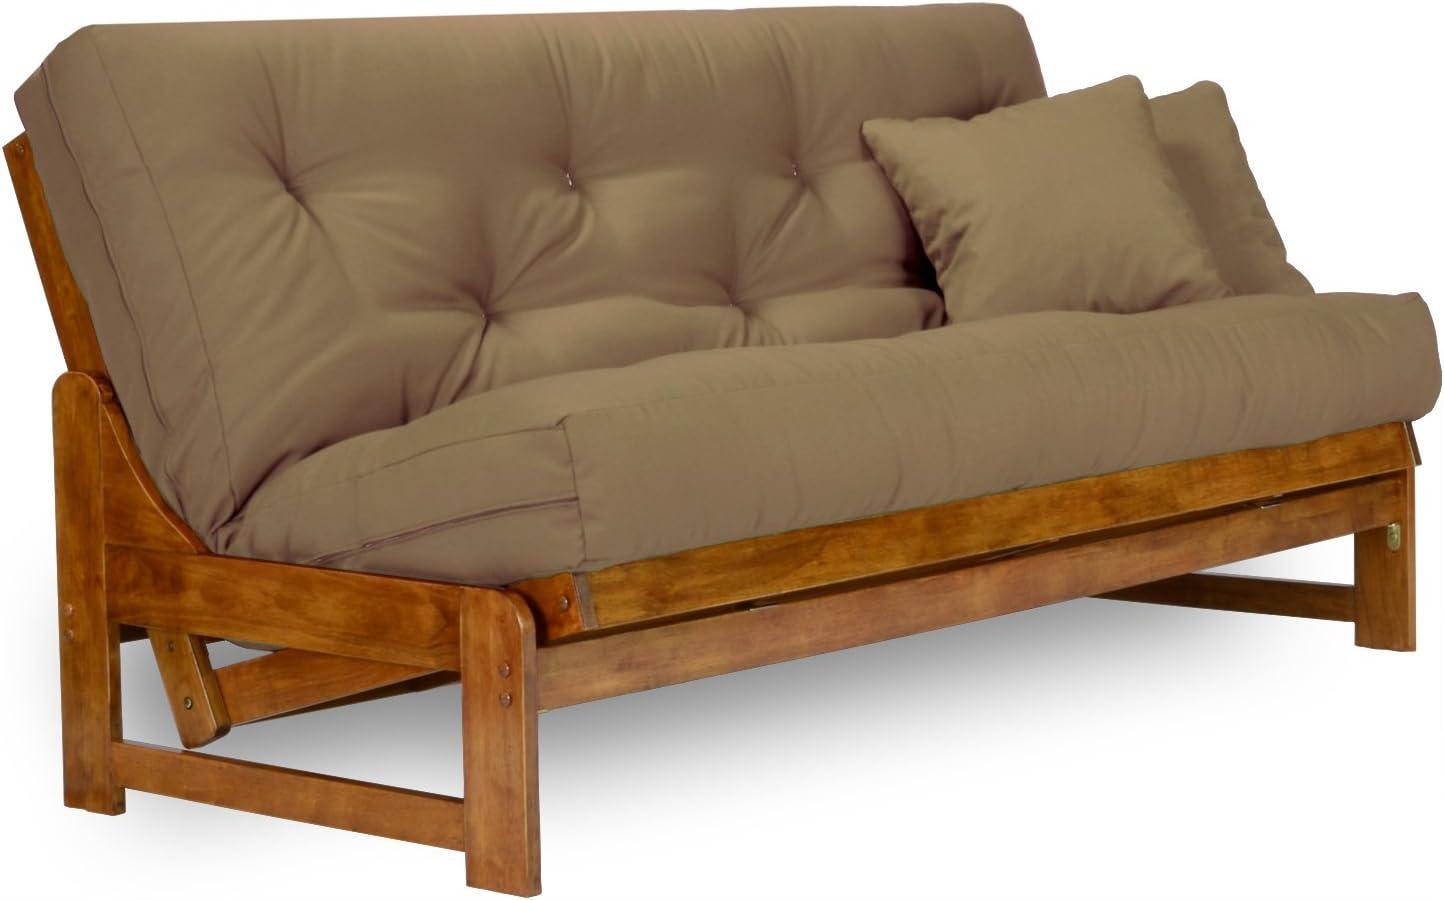 arden futon set   full size futon frame with mattress included  8 inch thick mattress futons   amazon    rh   amazon